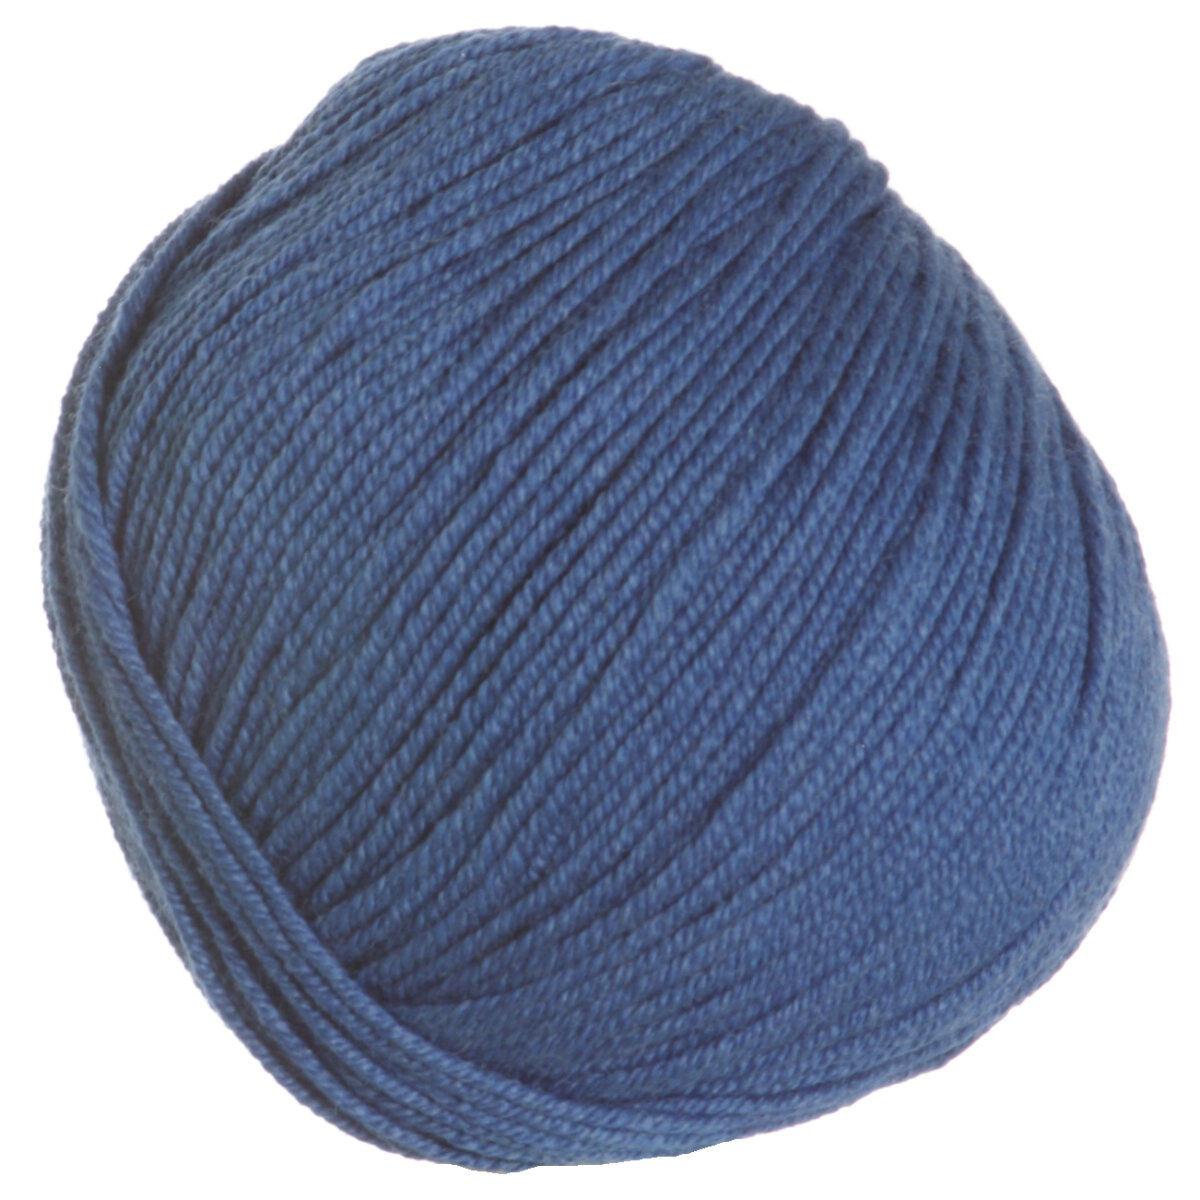 Knitting Patterns Rowan Wool Cotton : Rowan Wool Cotton Yarn - 988 - Larkspur at Jimmy Beans Wool